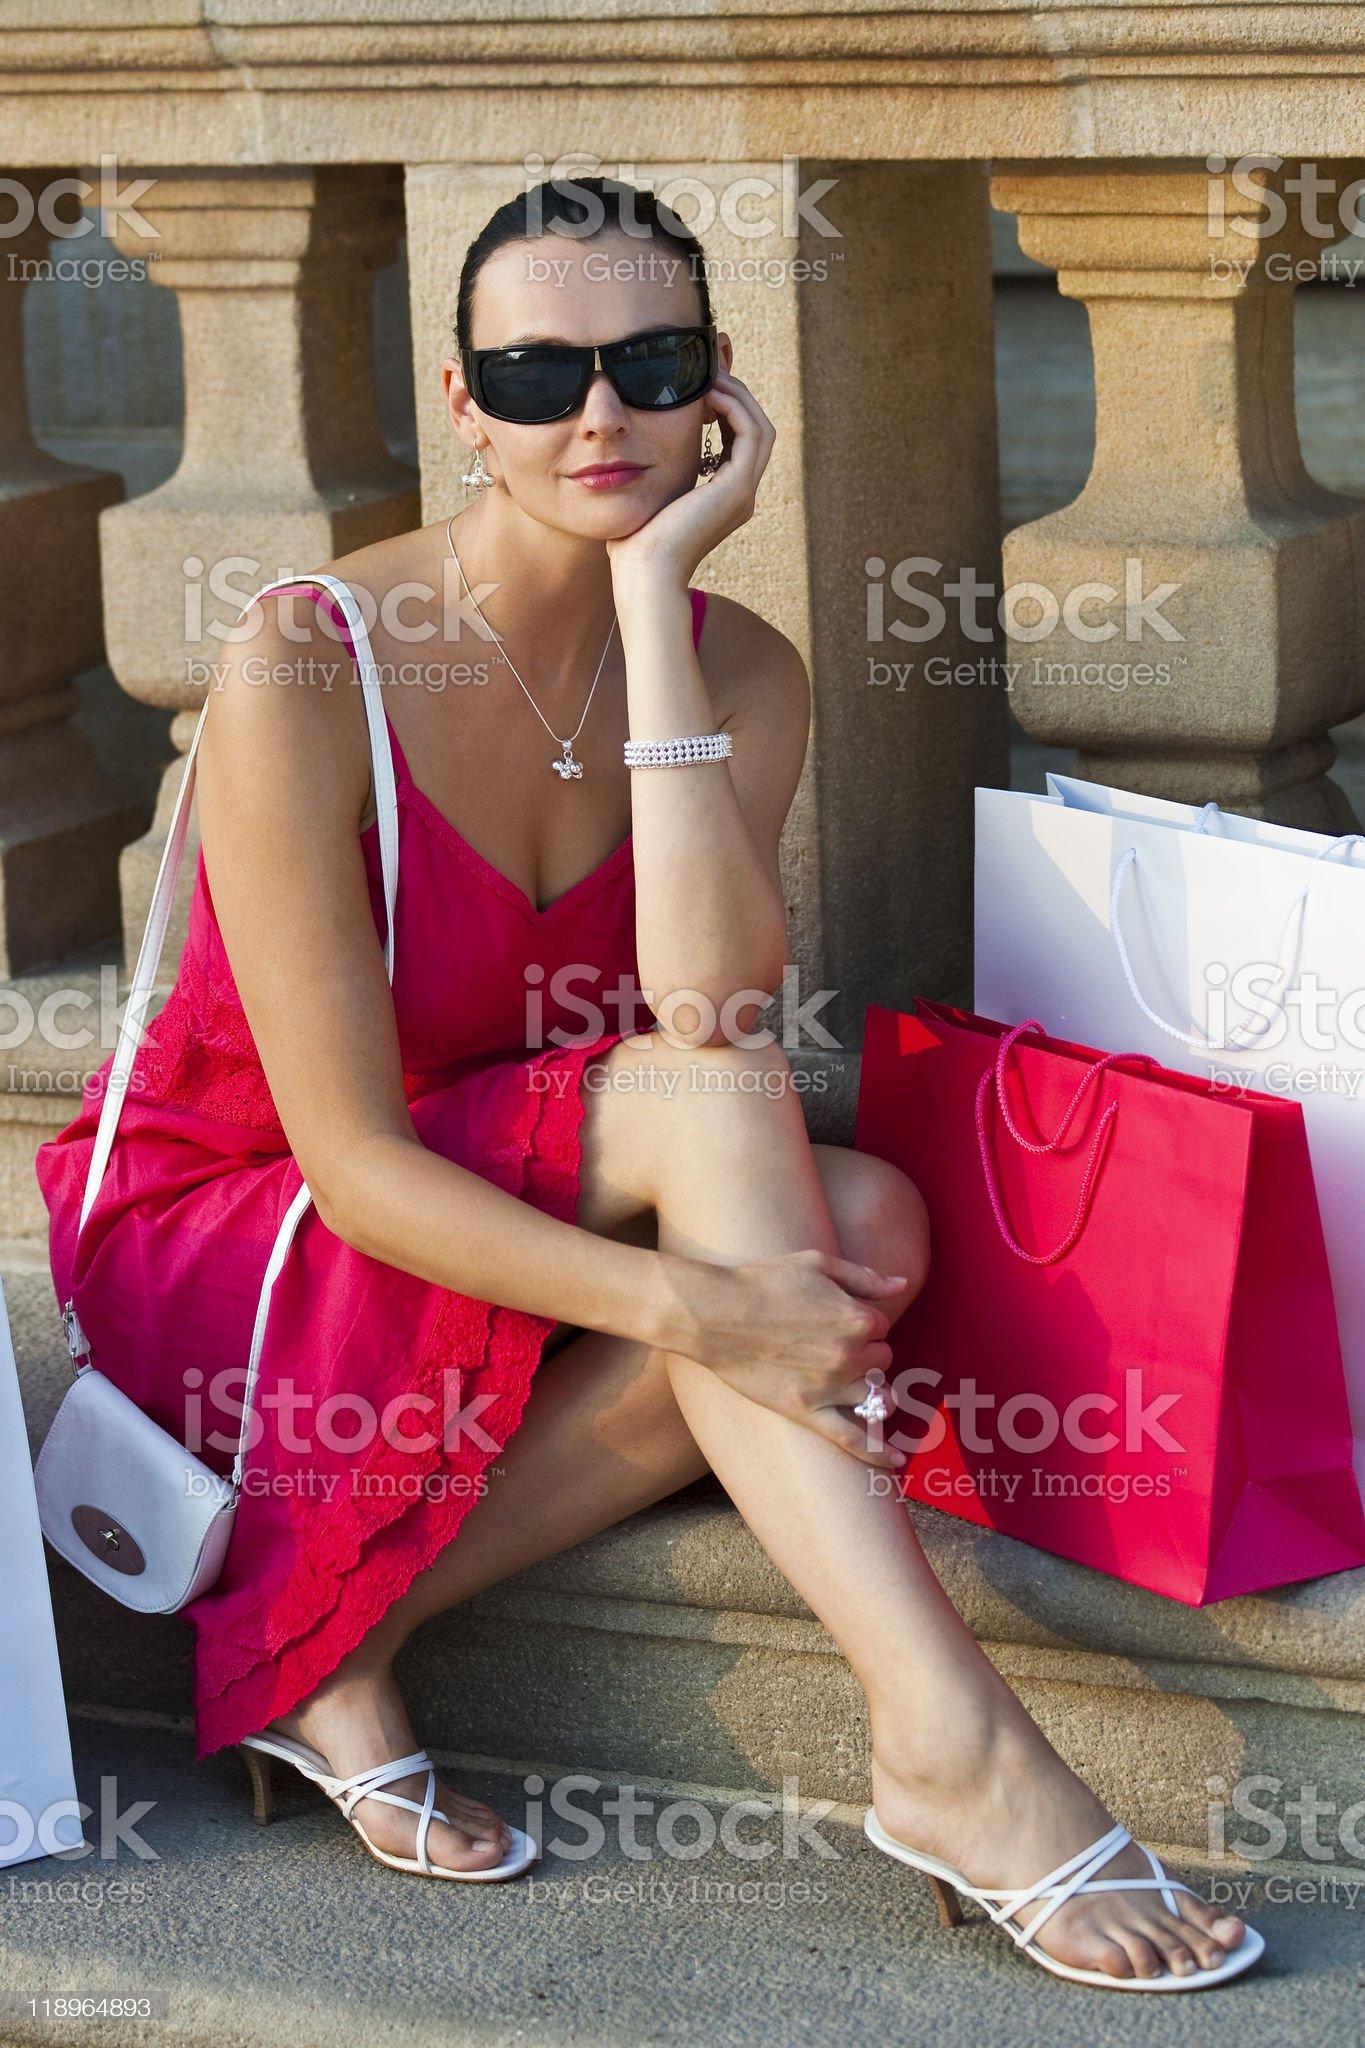 Beautiful Latina Hispanic Woman Sitting With Shopping Bags royalty-free stock photo